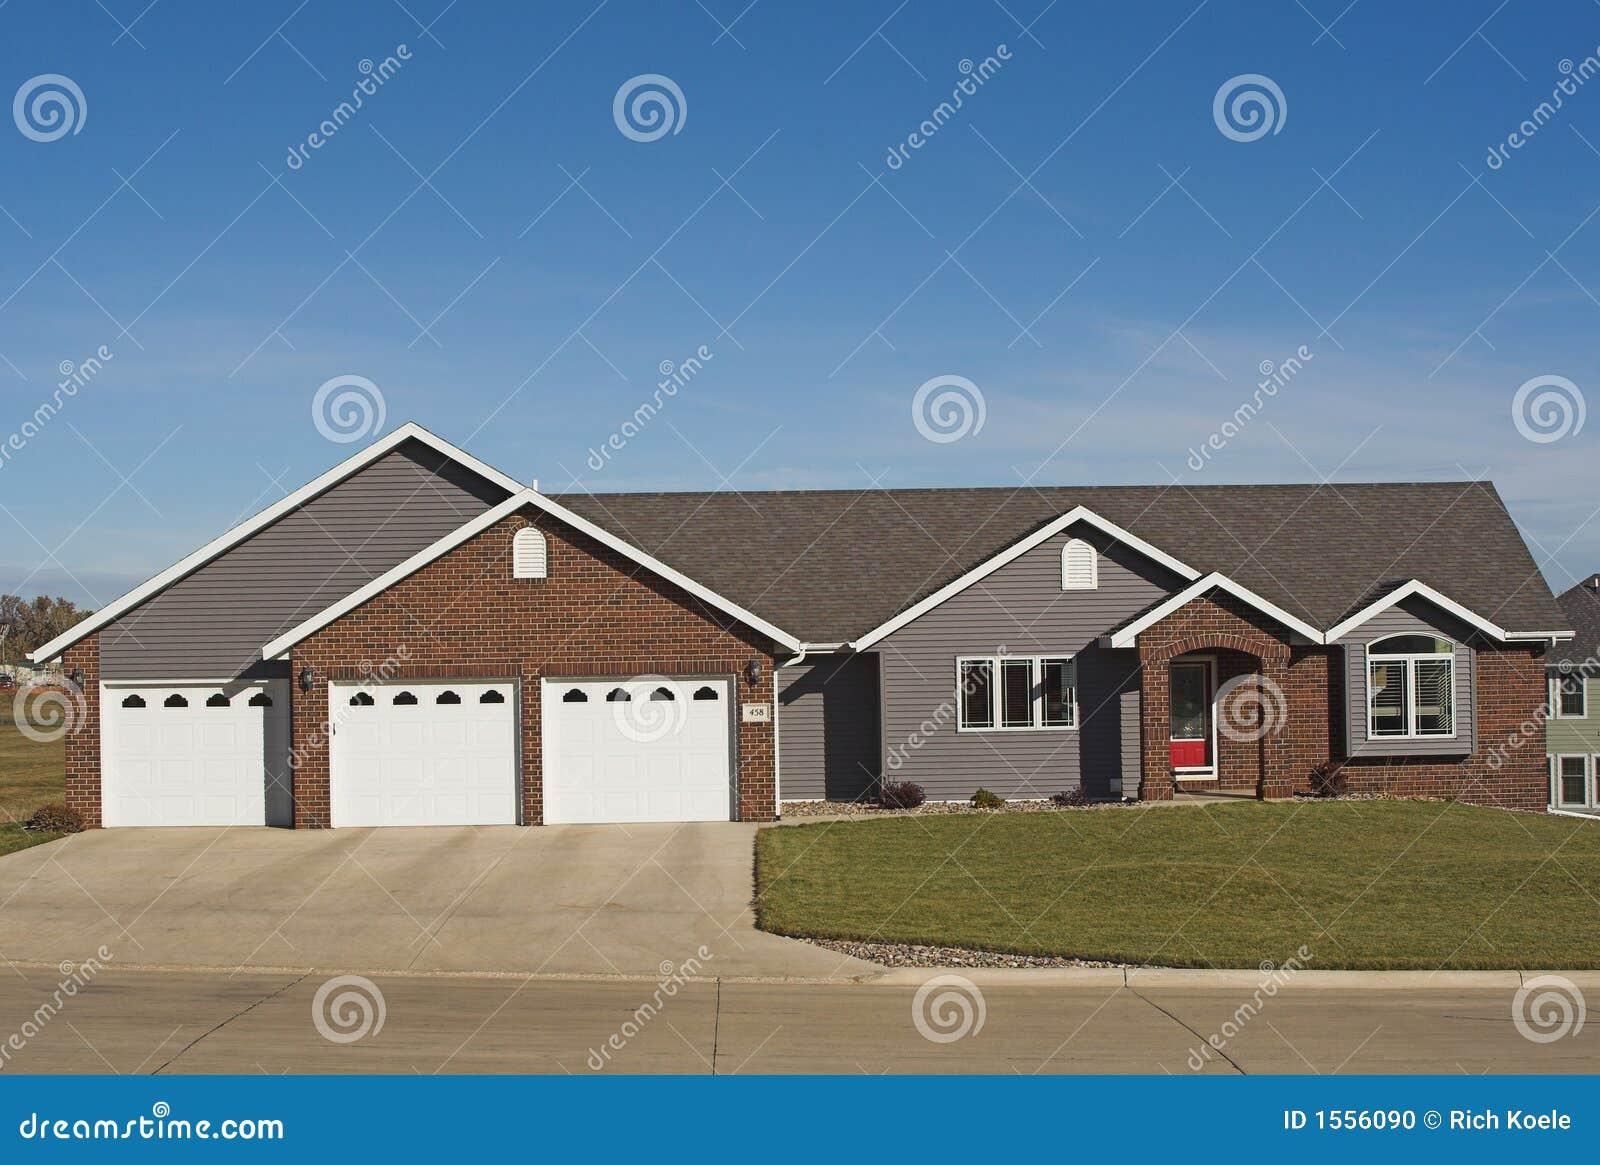 New executive ranch home stock photo image 1556090 for Executive ranch homes